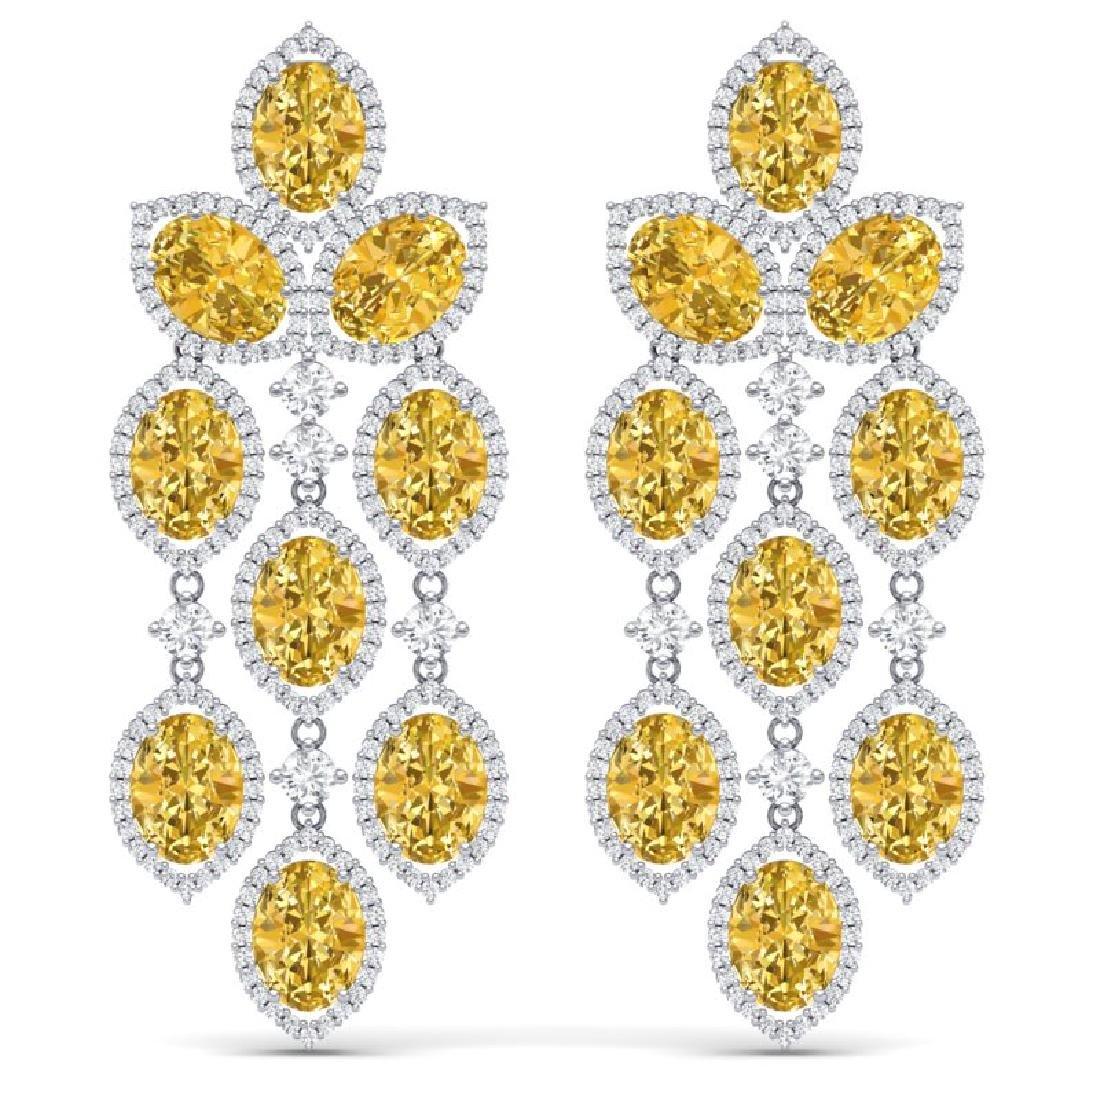 24.54 CTW Royalty Canary Citrine & VS Diamond Earrings